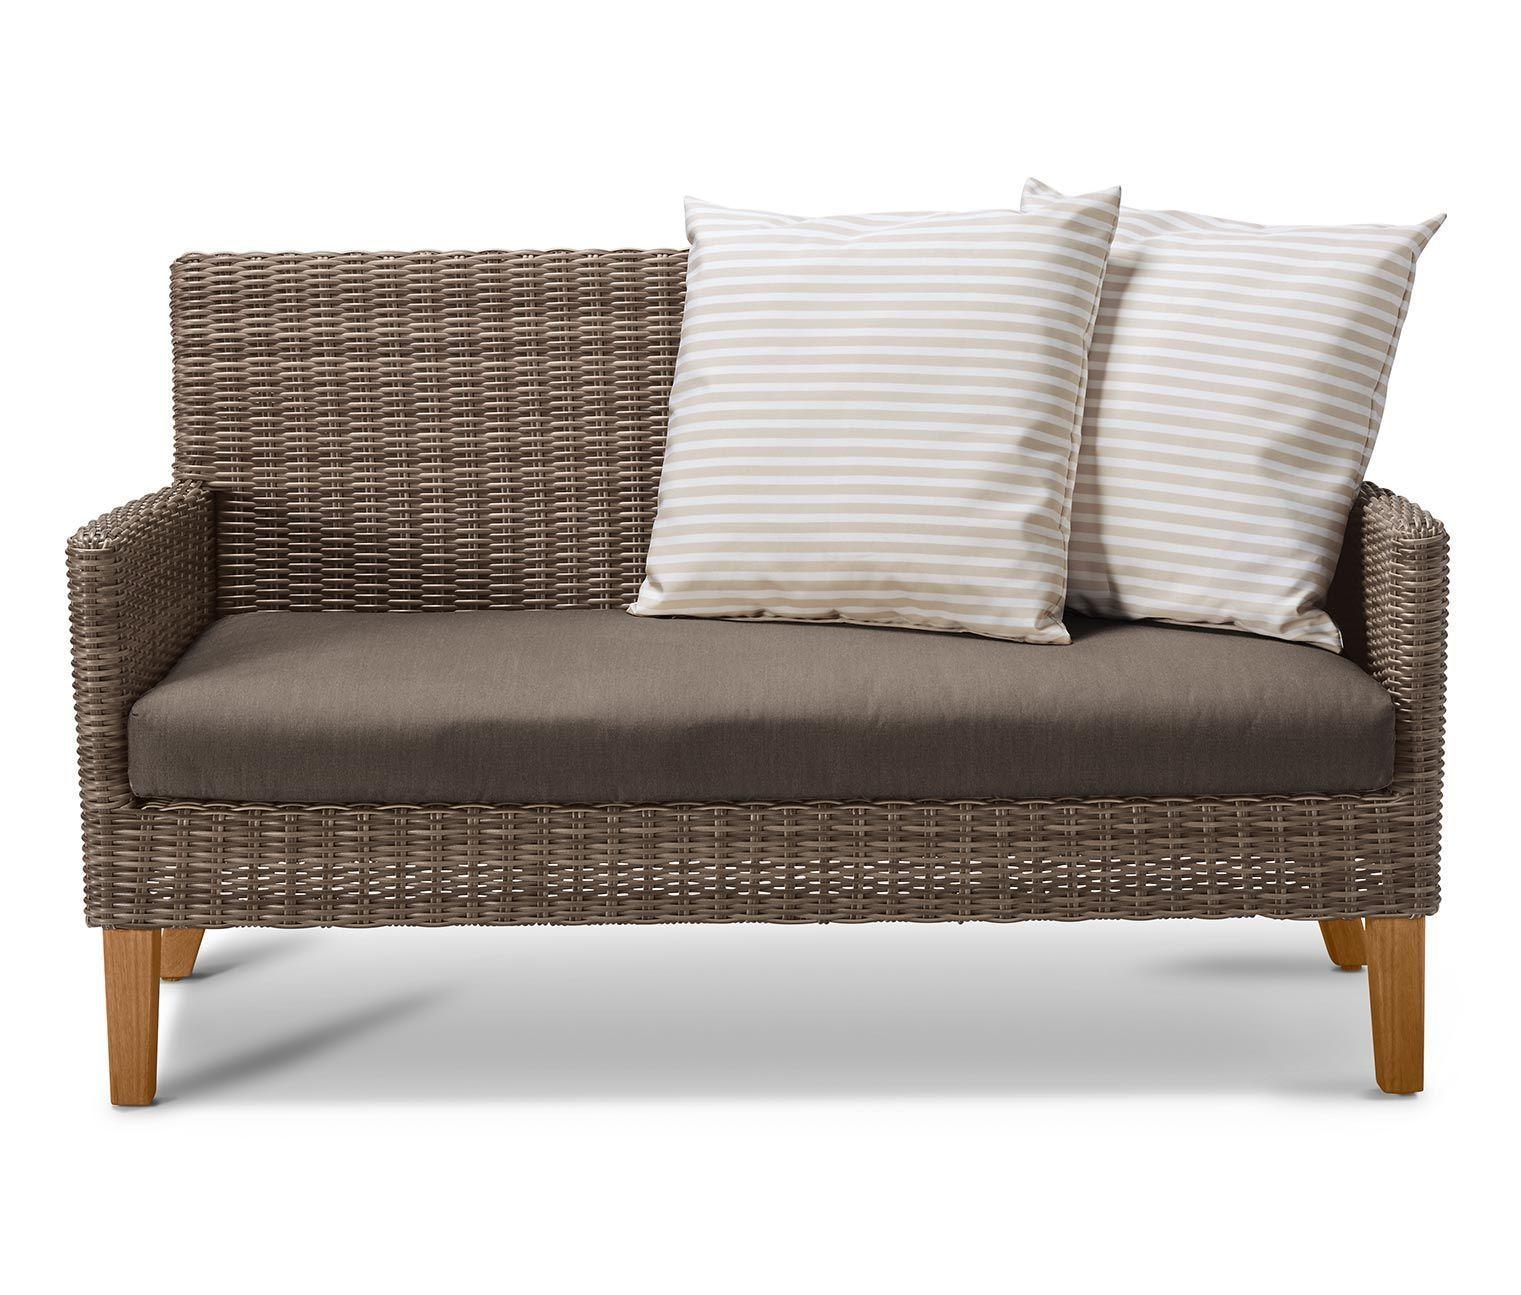 2sitzer Bei Bestellen Gartensofa Ikea Balkonmobel Online